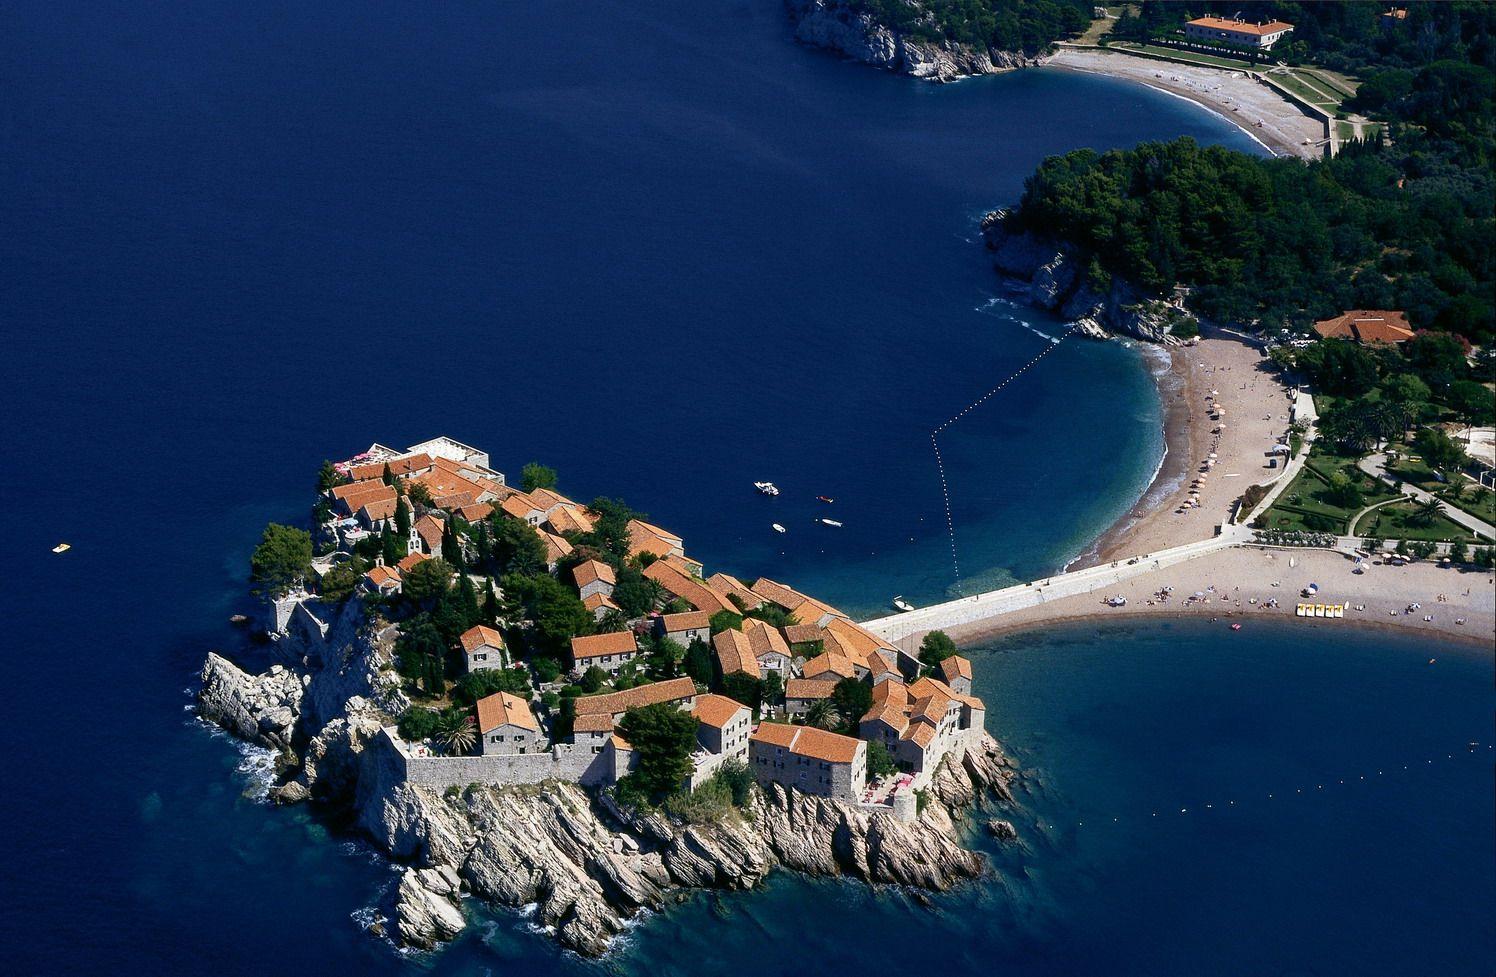 Saint Stefan Hotel Dalmatian Coast Monte